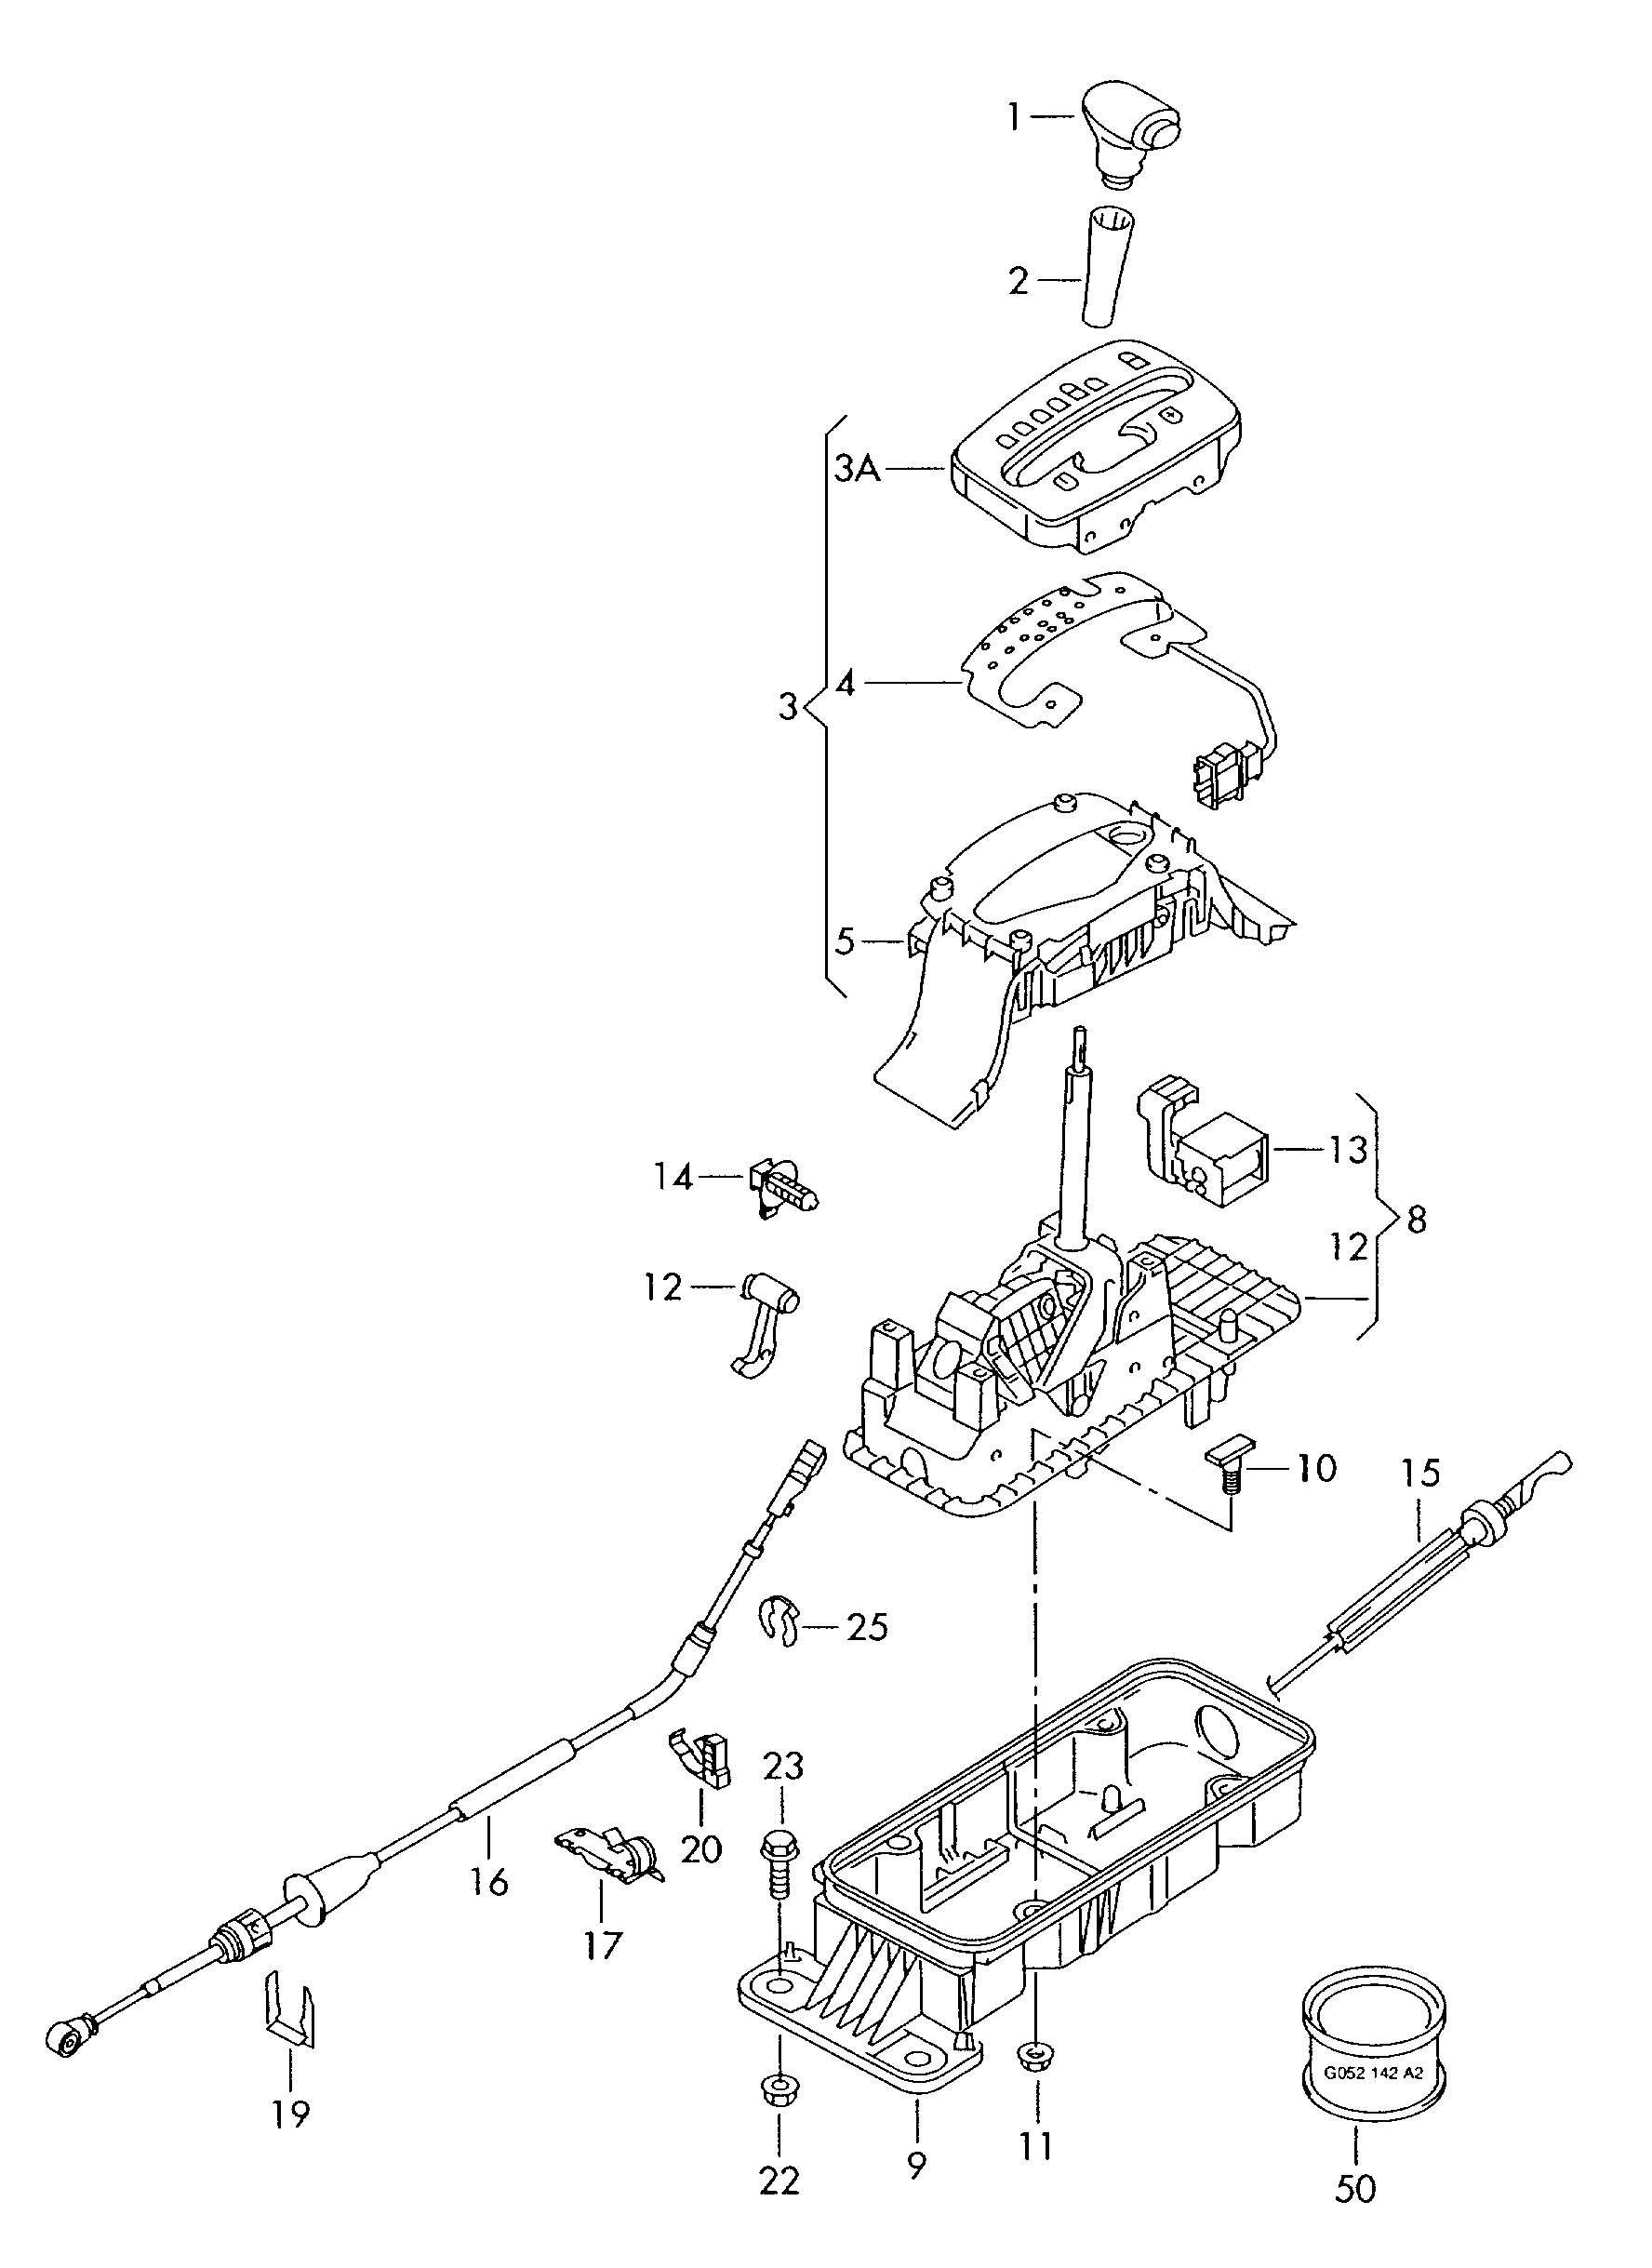 Wiring Diagram PDF: 2002 Transaxle Wiring Diagram Jetta 2002